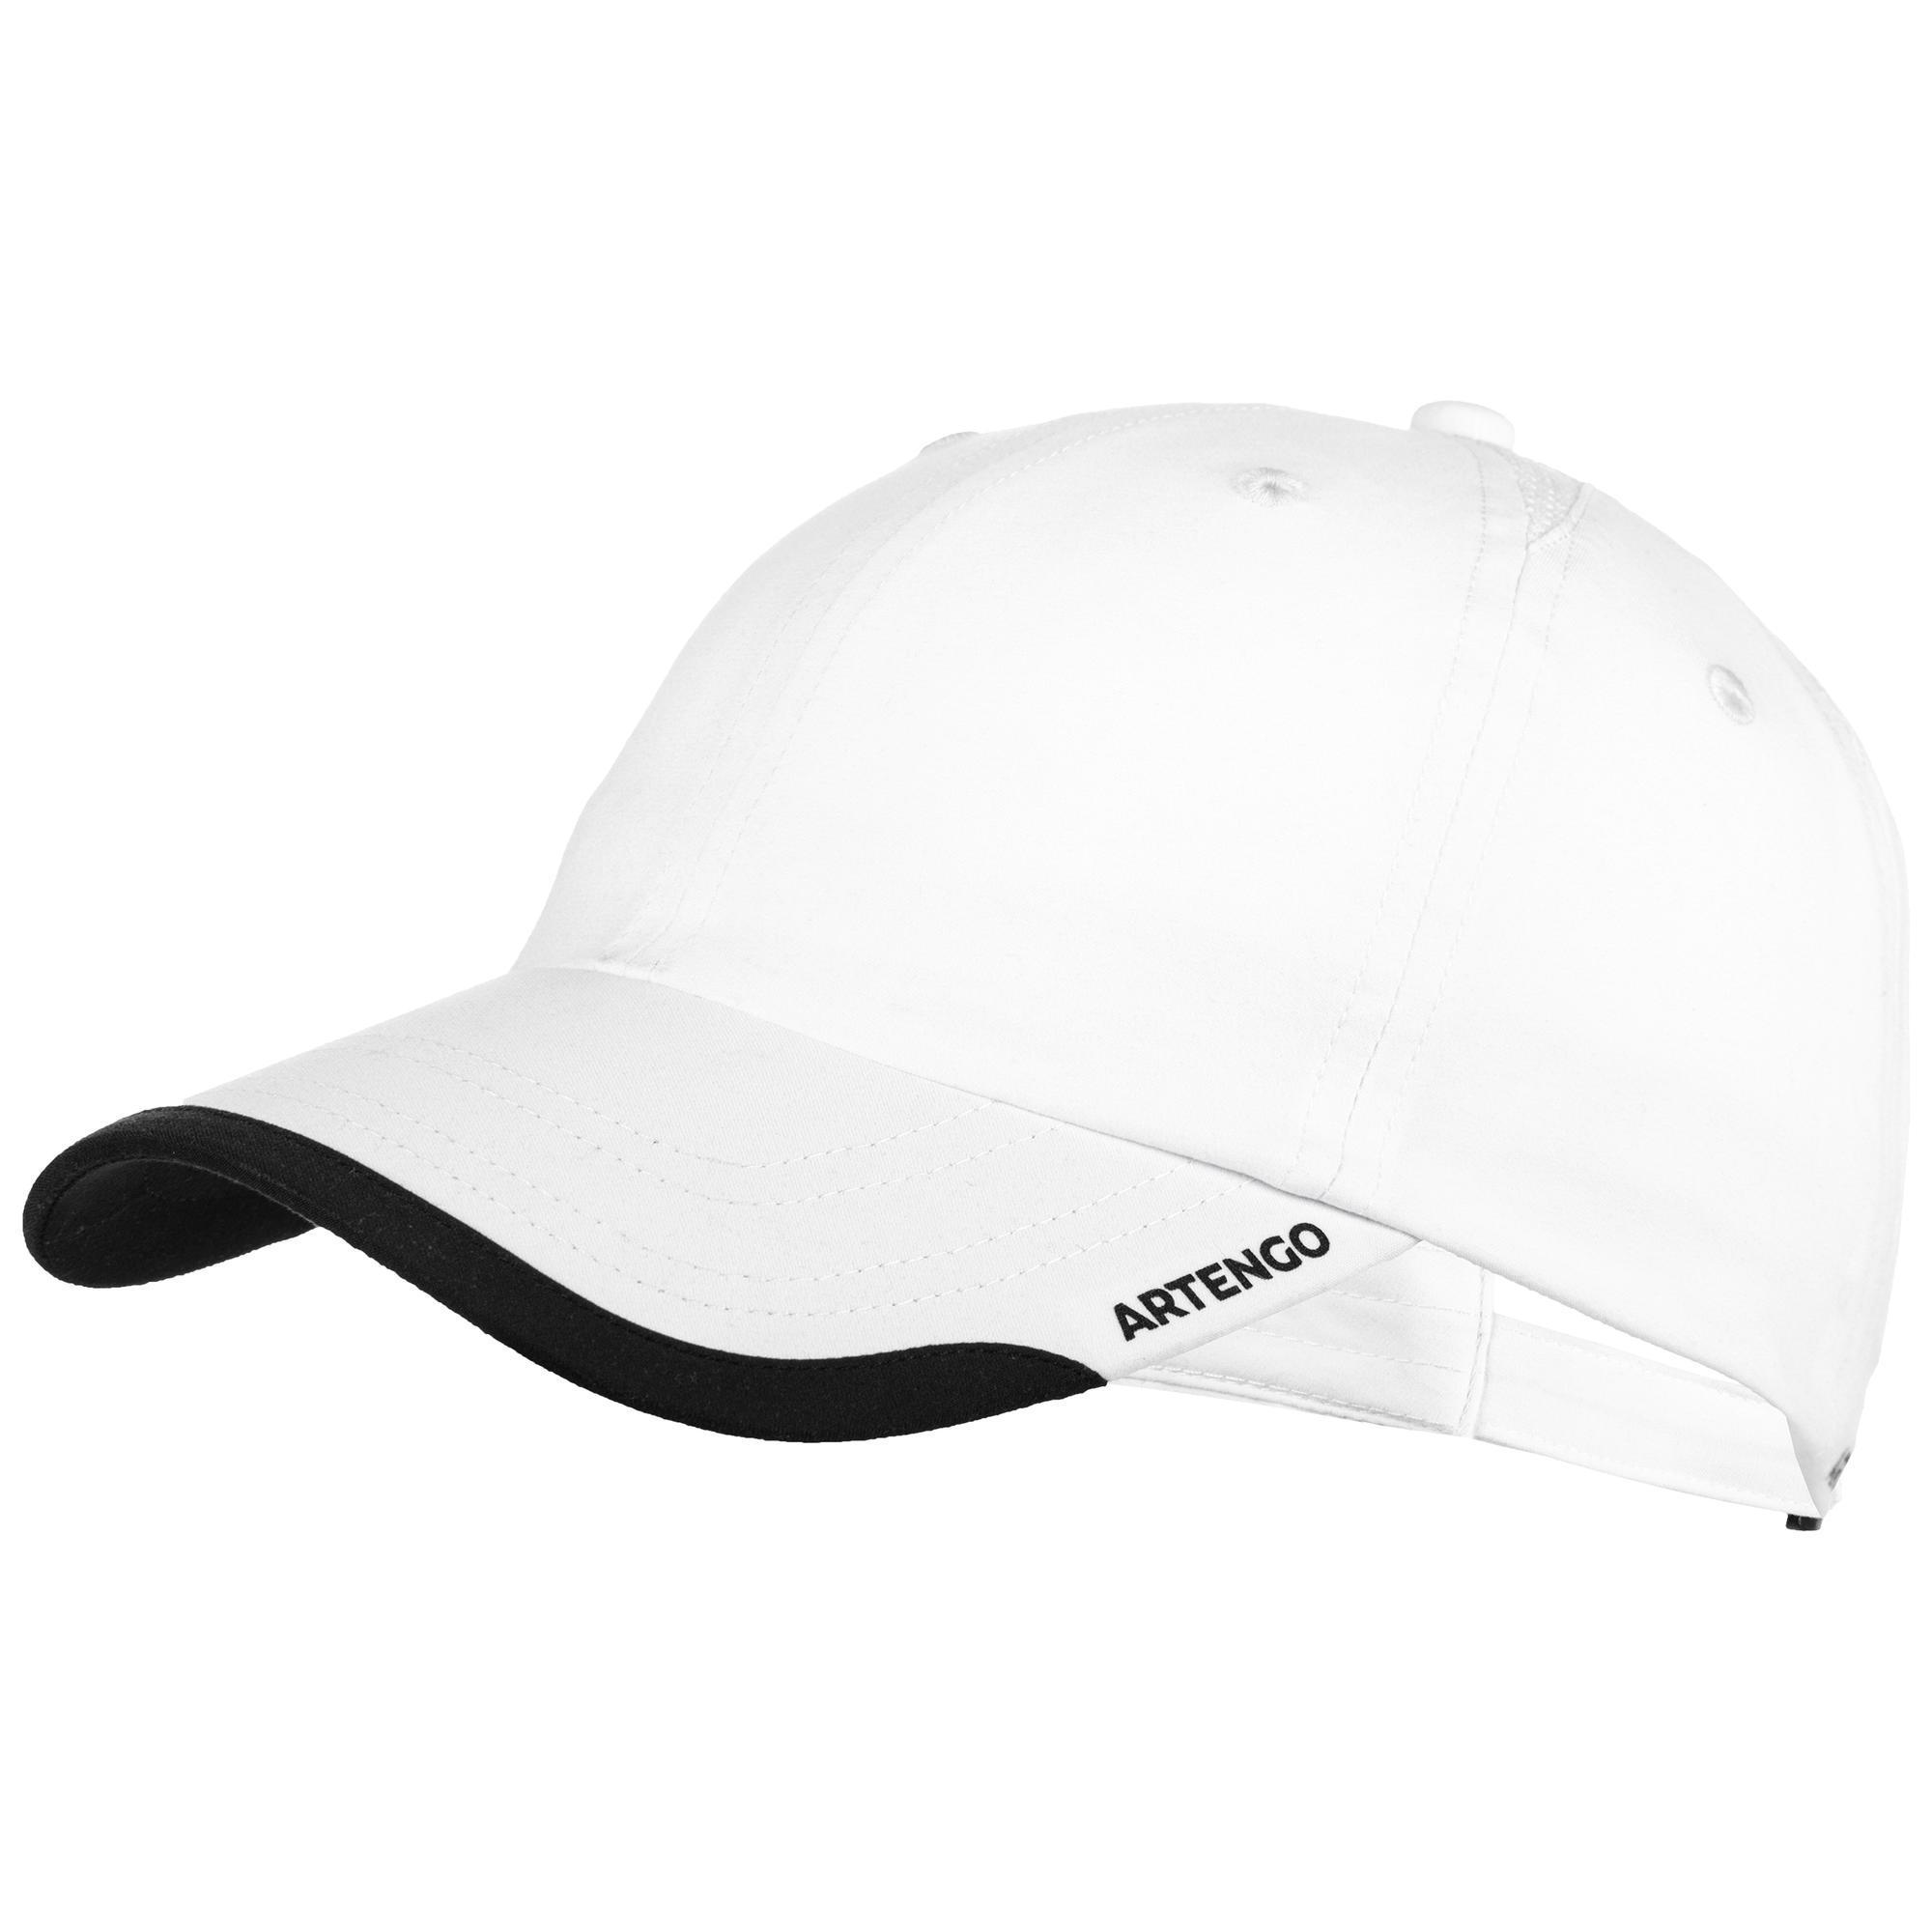 Tennis-Kappe Schirmmütze flexibel Racketsport TC 100 weiß | Accessoires > Caps | Artengo